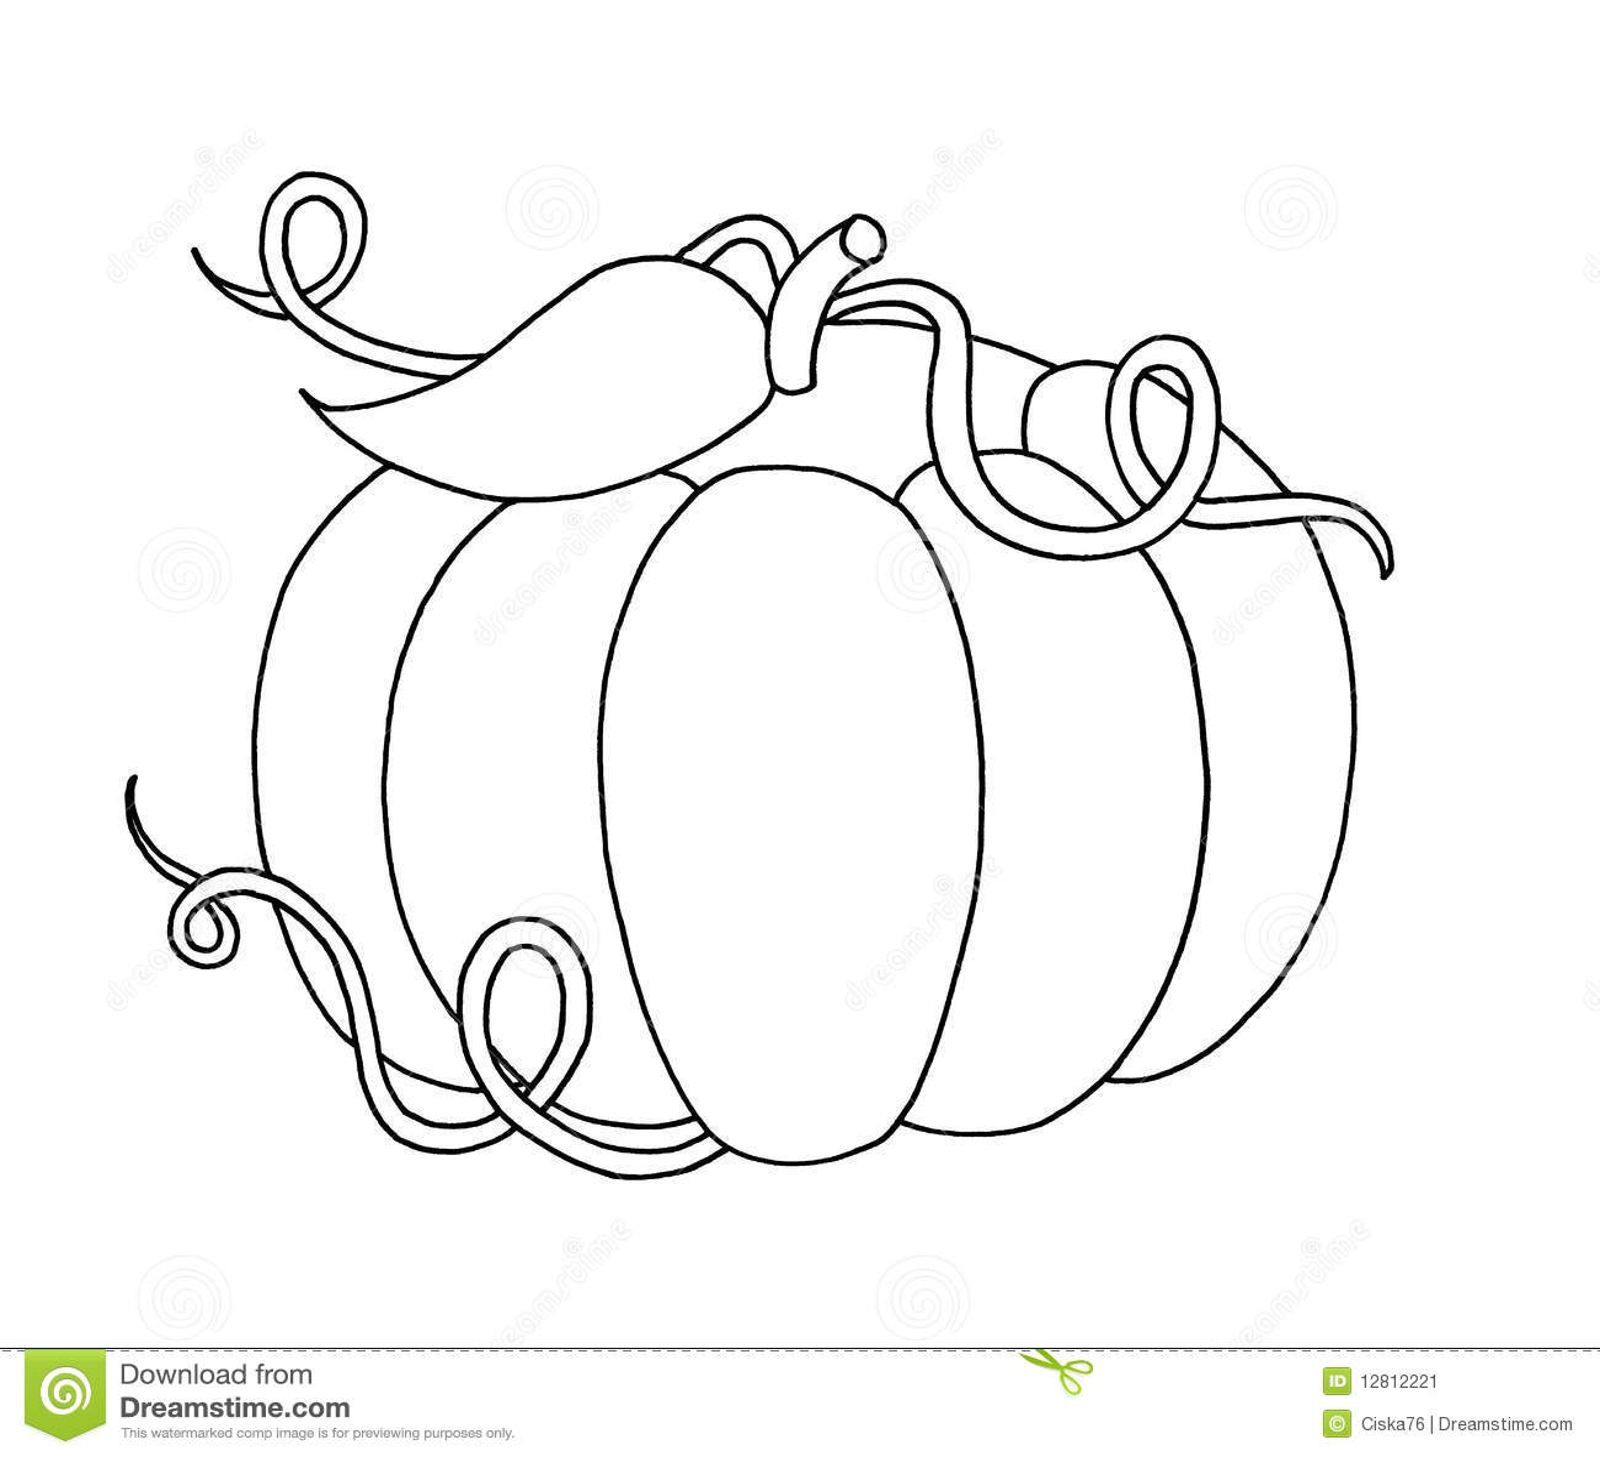 free pumpkin vine coloring pages - photo#22